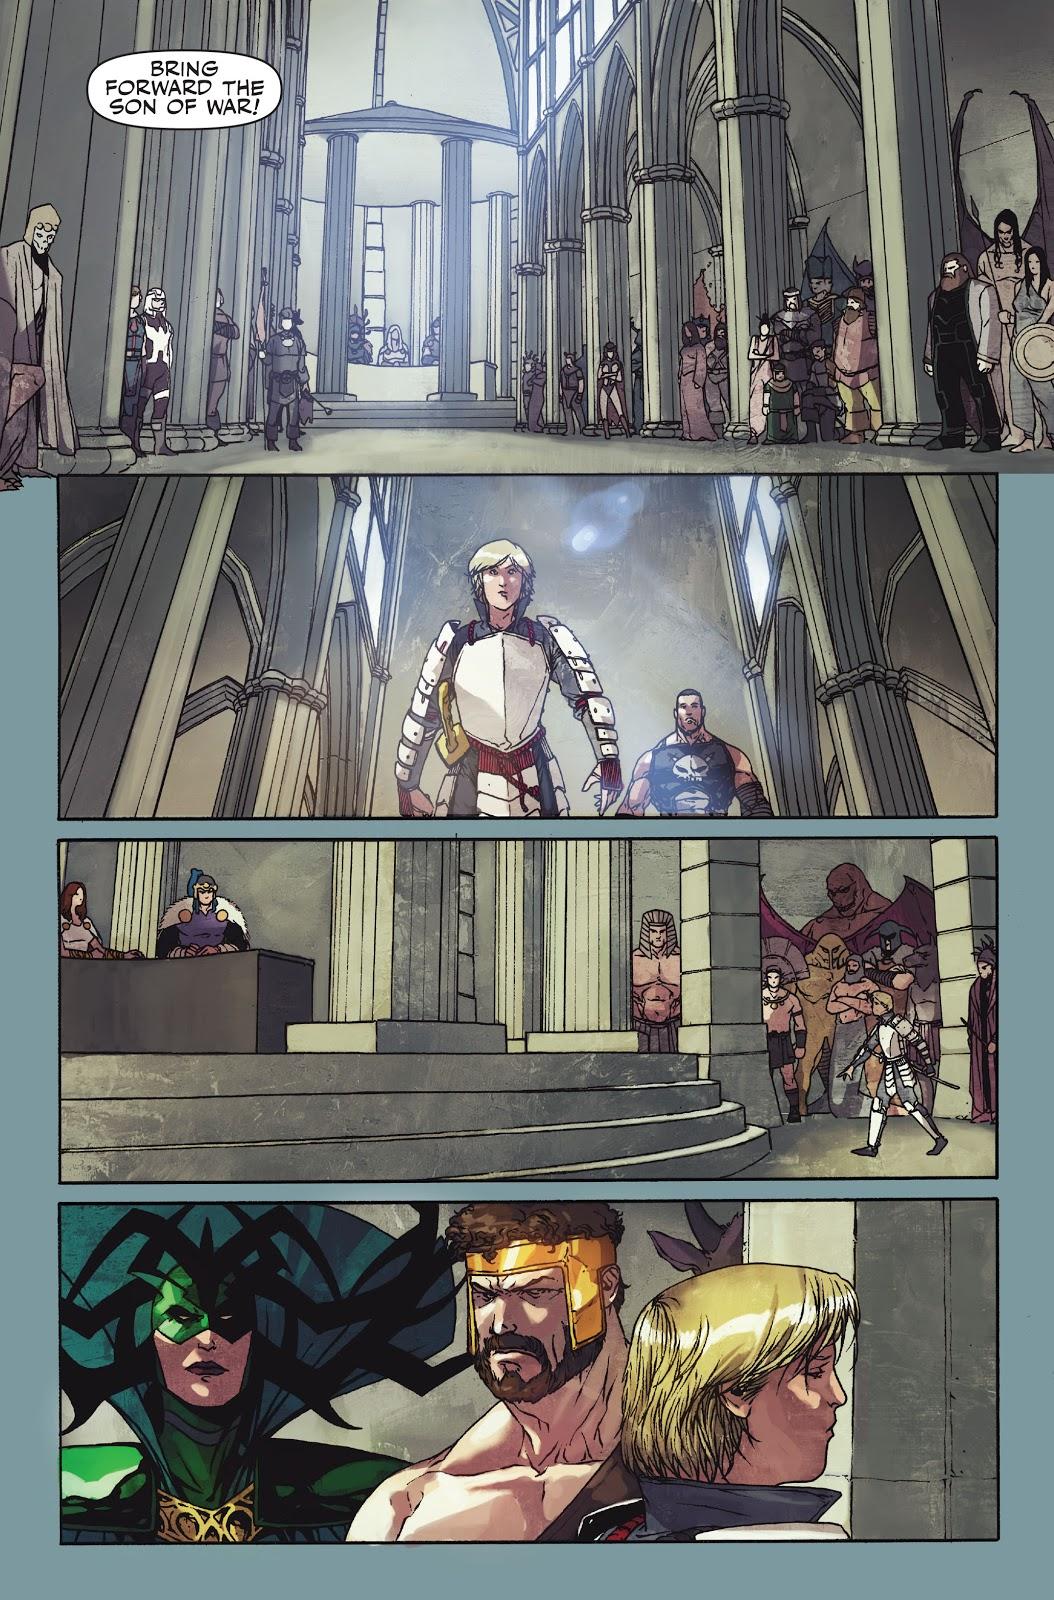 Secret Warriors Vol 1 10 Page 20.jpg